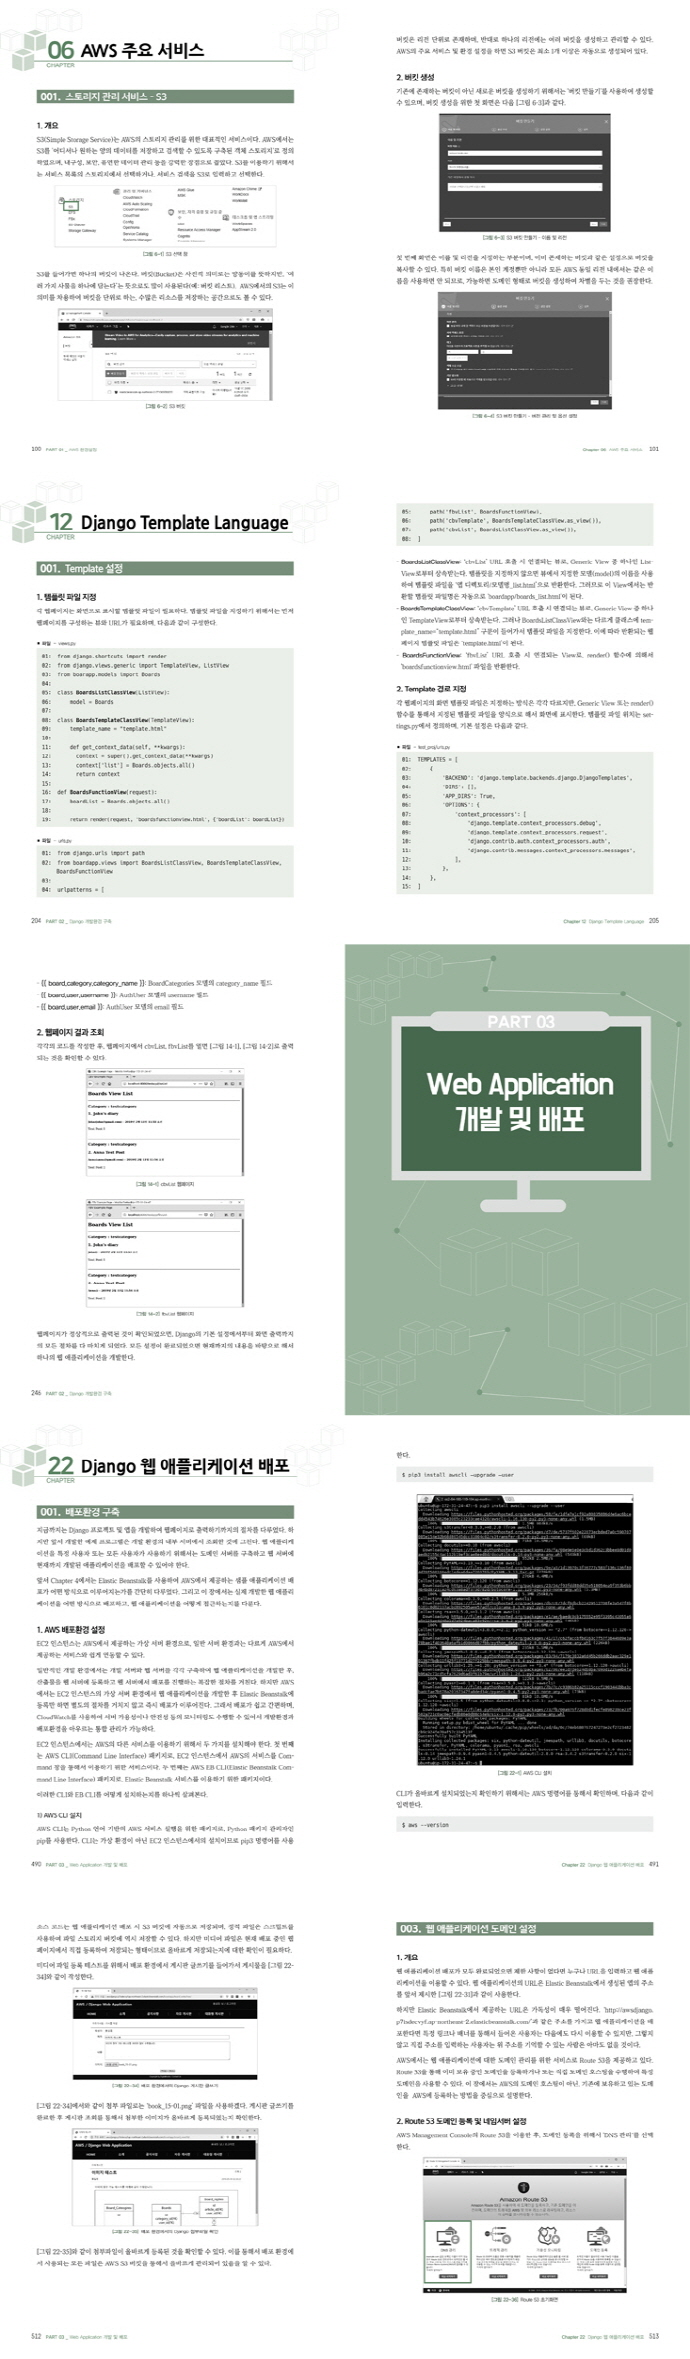 AWS 클라우드 기반의 Django 웹 애플리케이션 도서 상세이미지